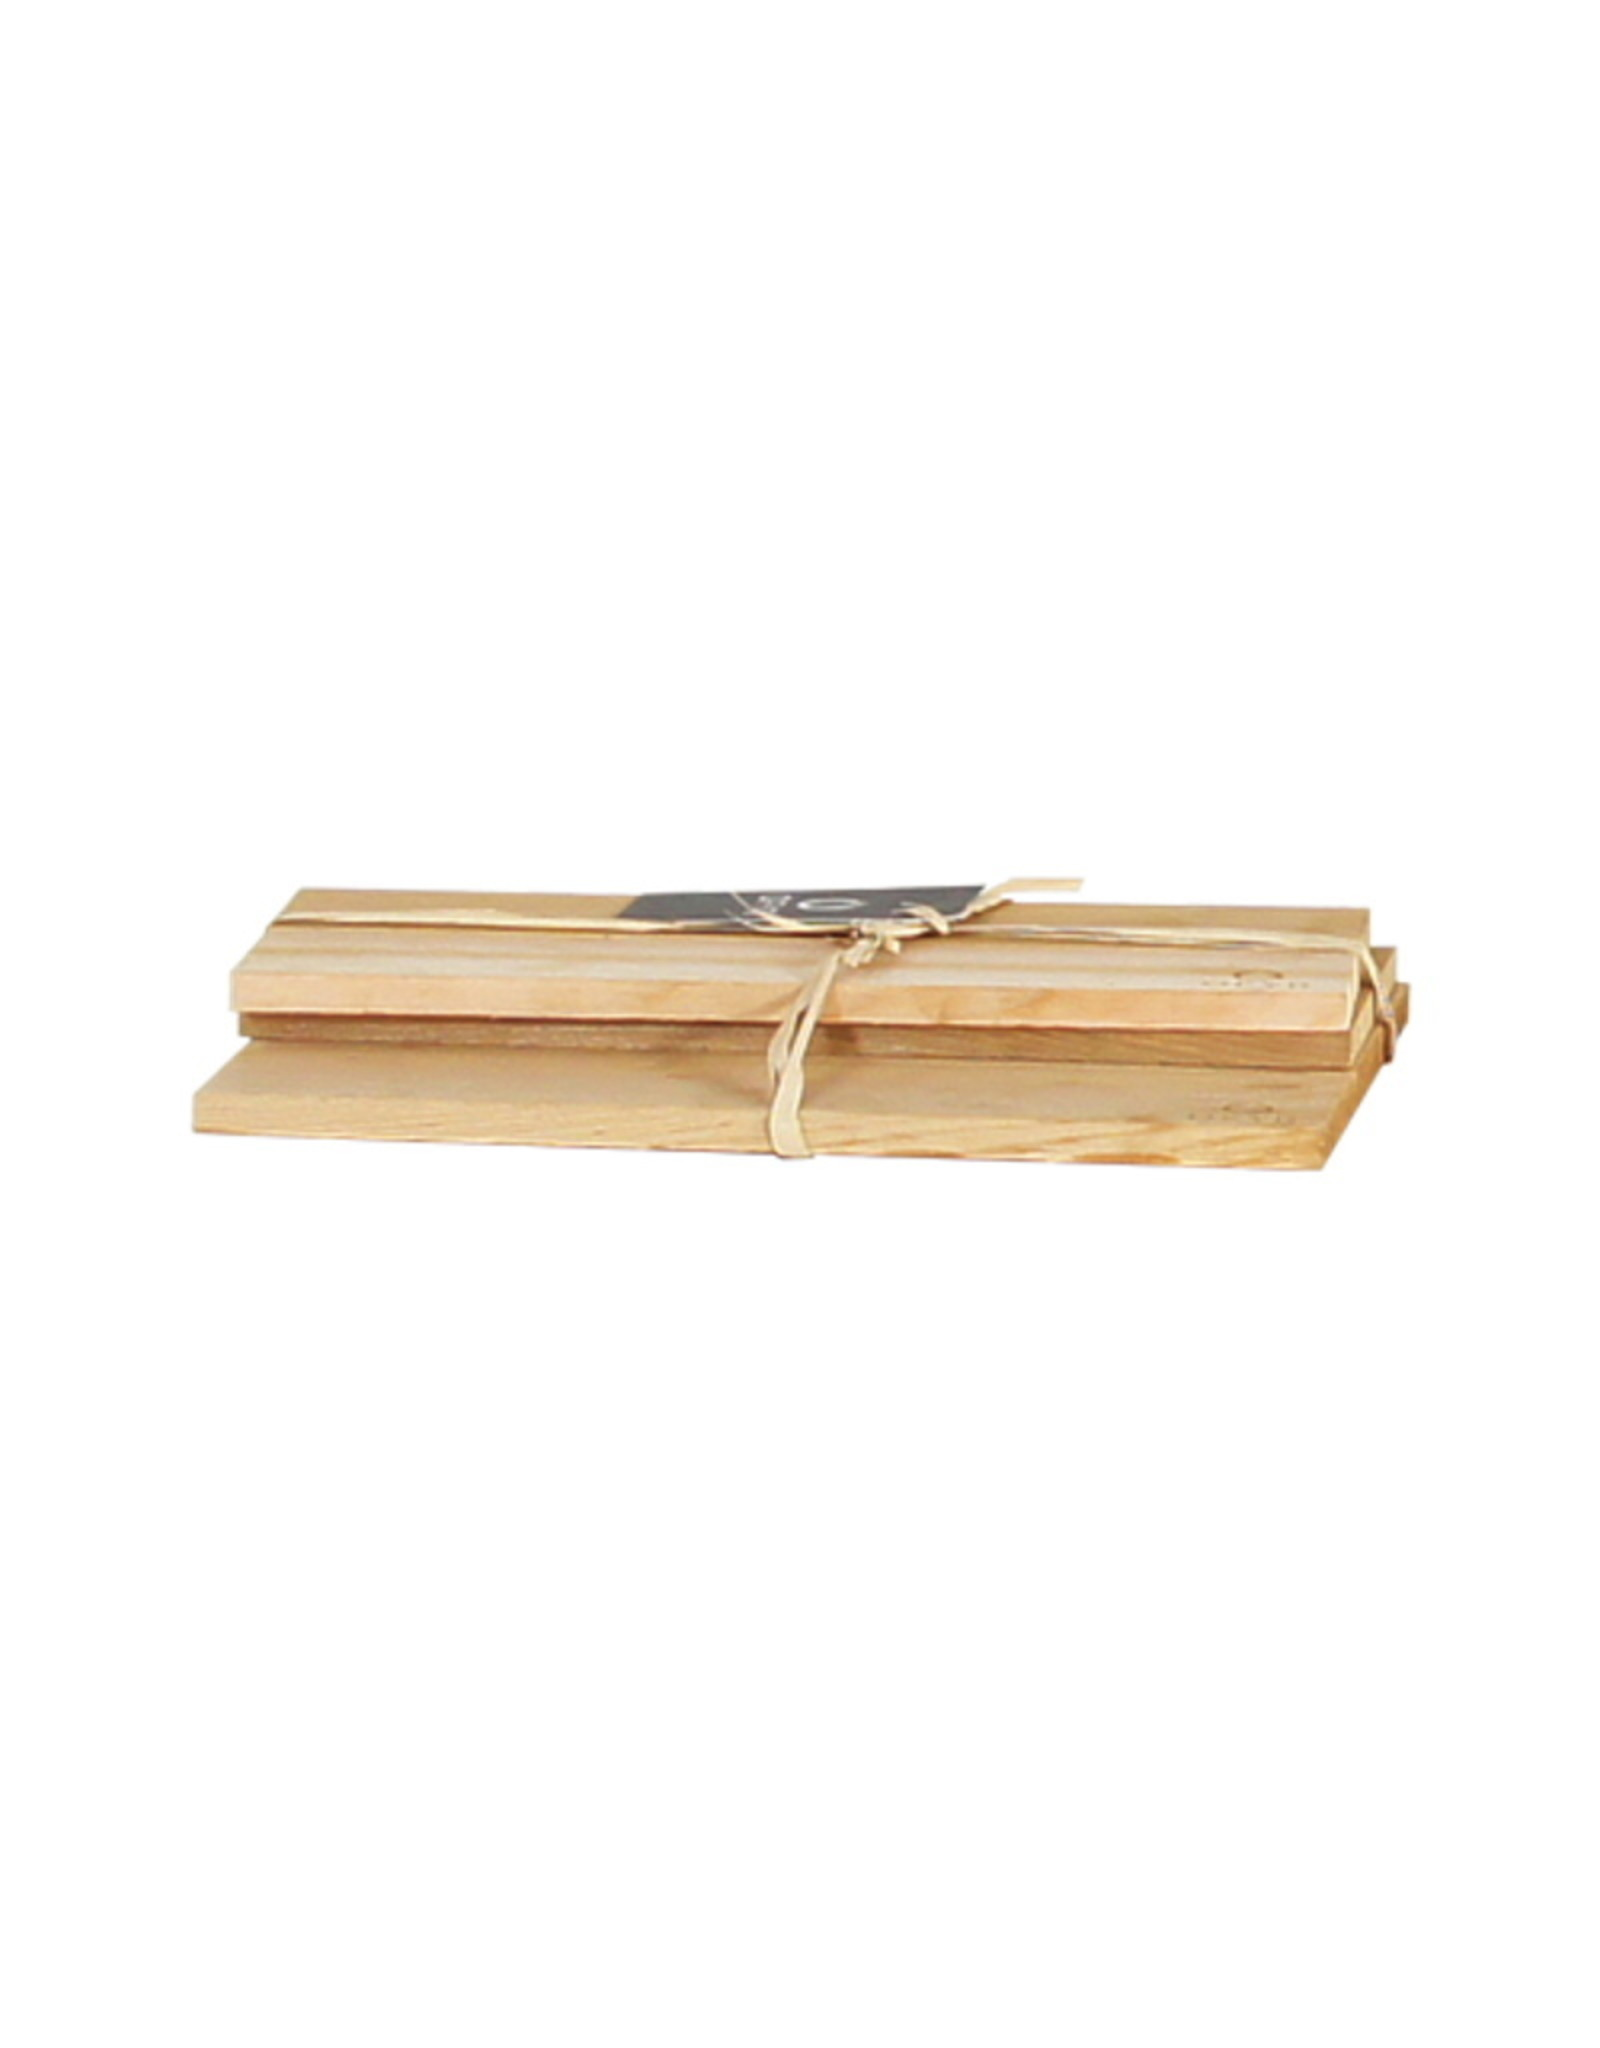 OFYR Cedar wooden planks